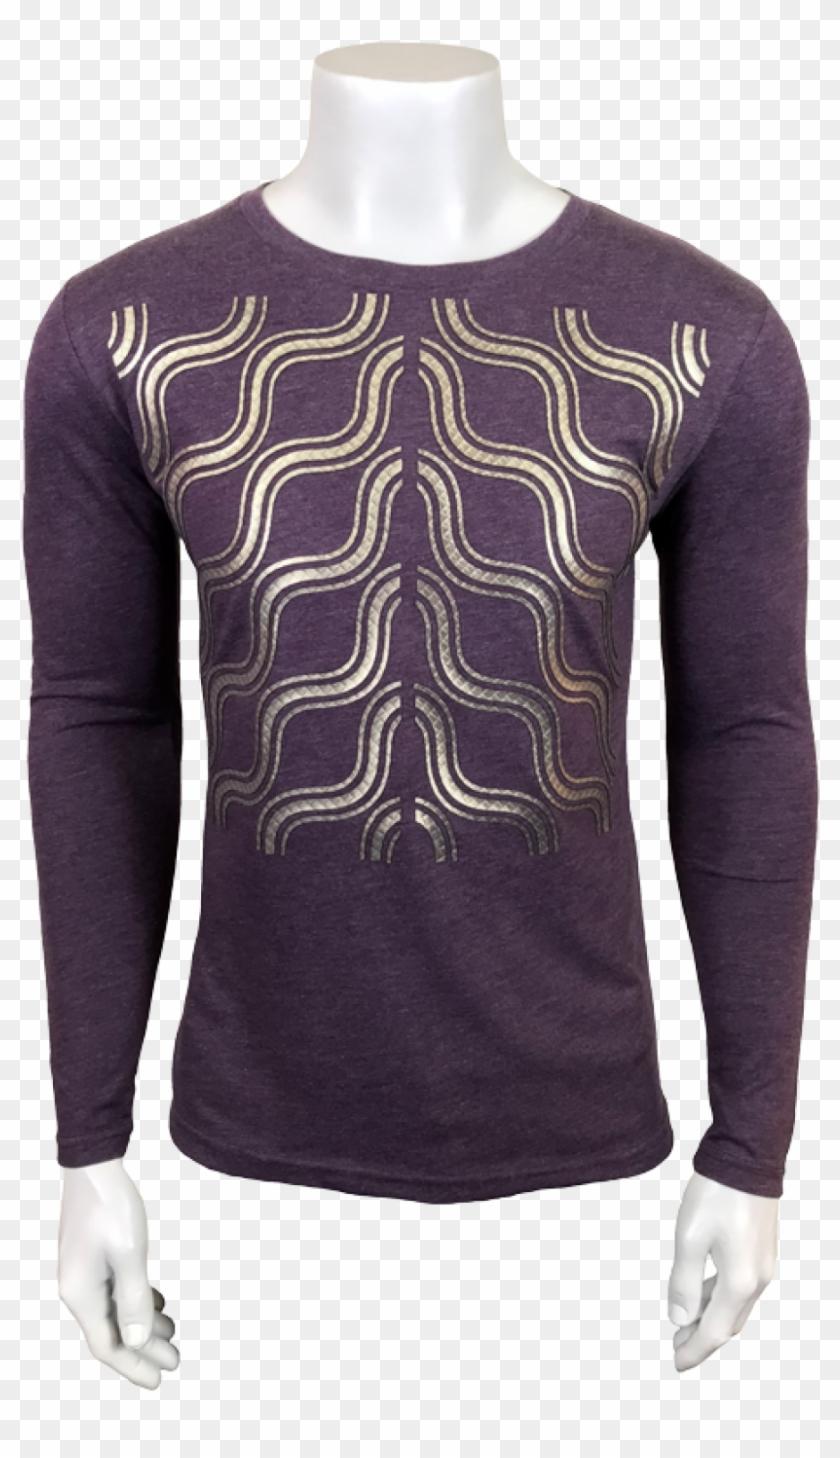 Cortex Crew - Long-sleeved T-shirt Clipart #5786708